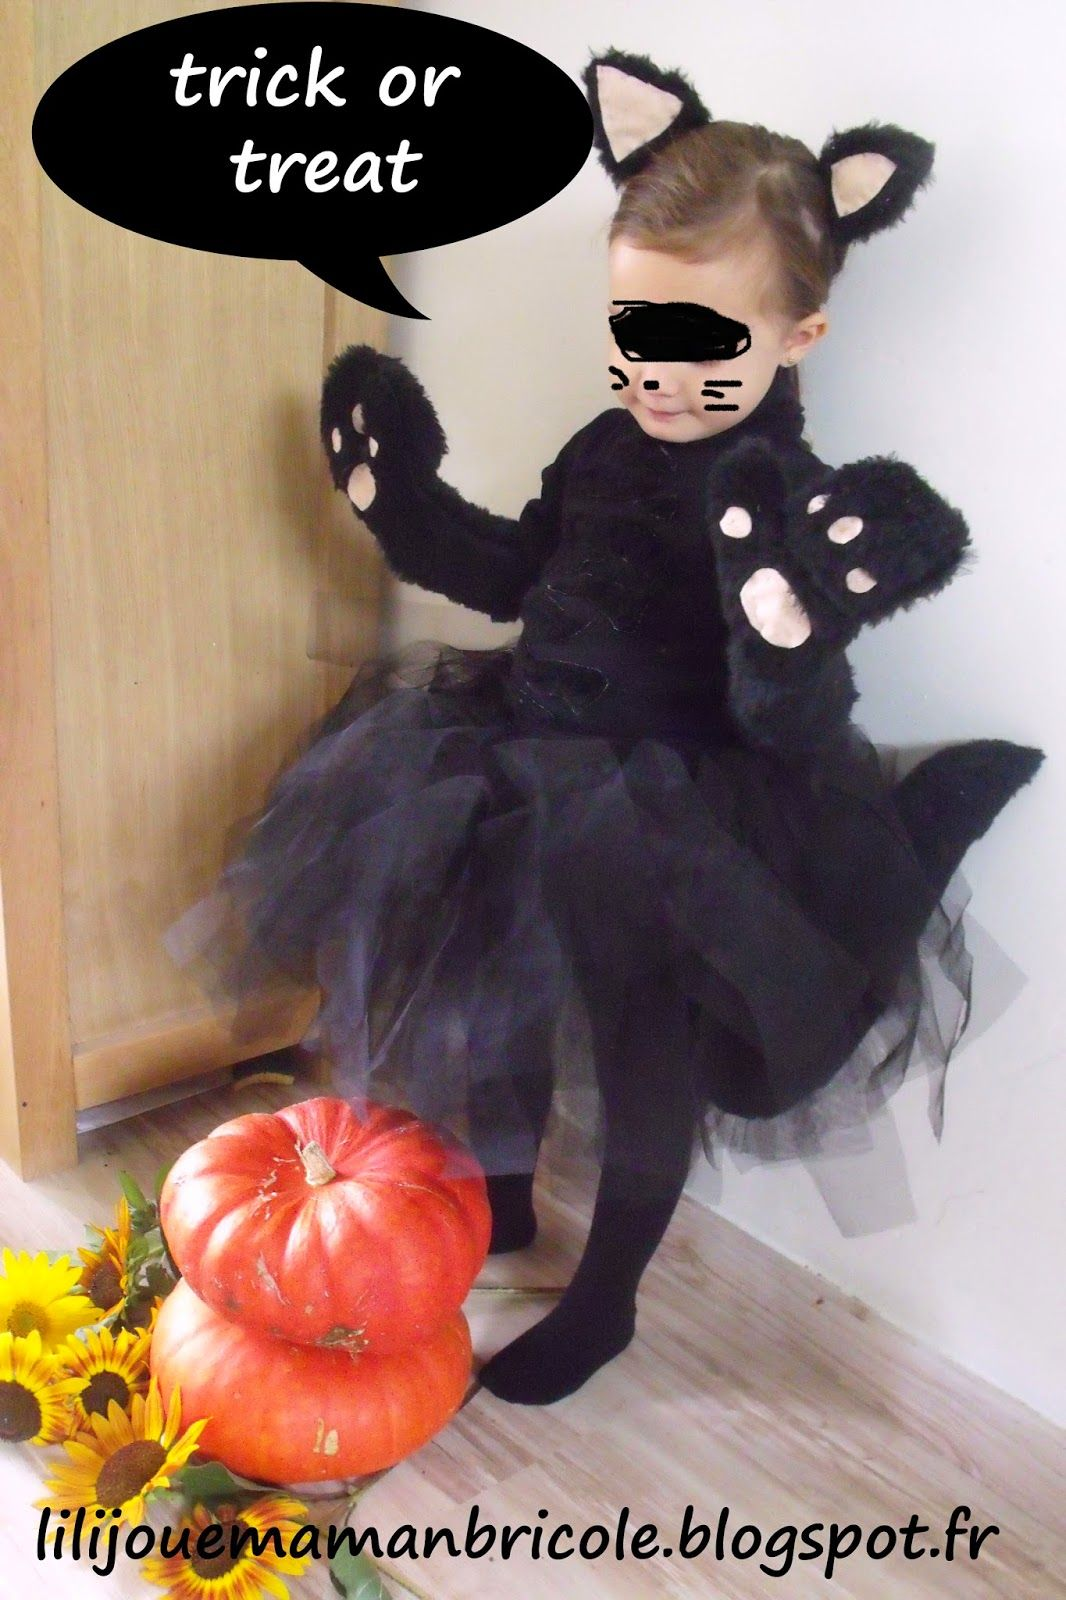 Quatang Gallery- Lili Joue Maman Bricole Tuto Costume Chat Noir Fille Pour Halloween Costume Chat Costume Chat Noir Et Deguisement Chat